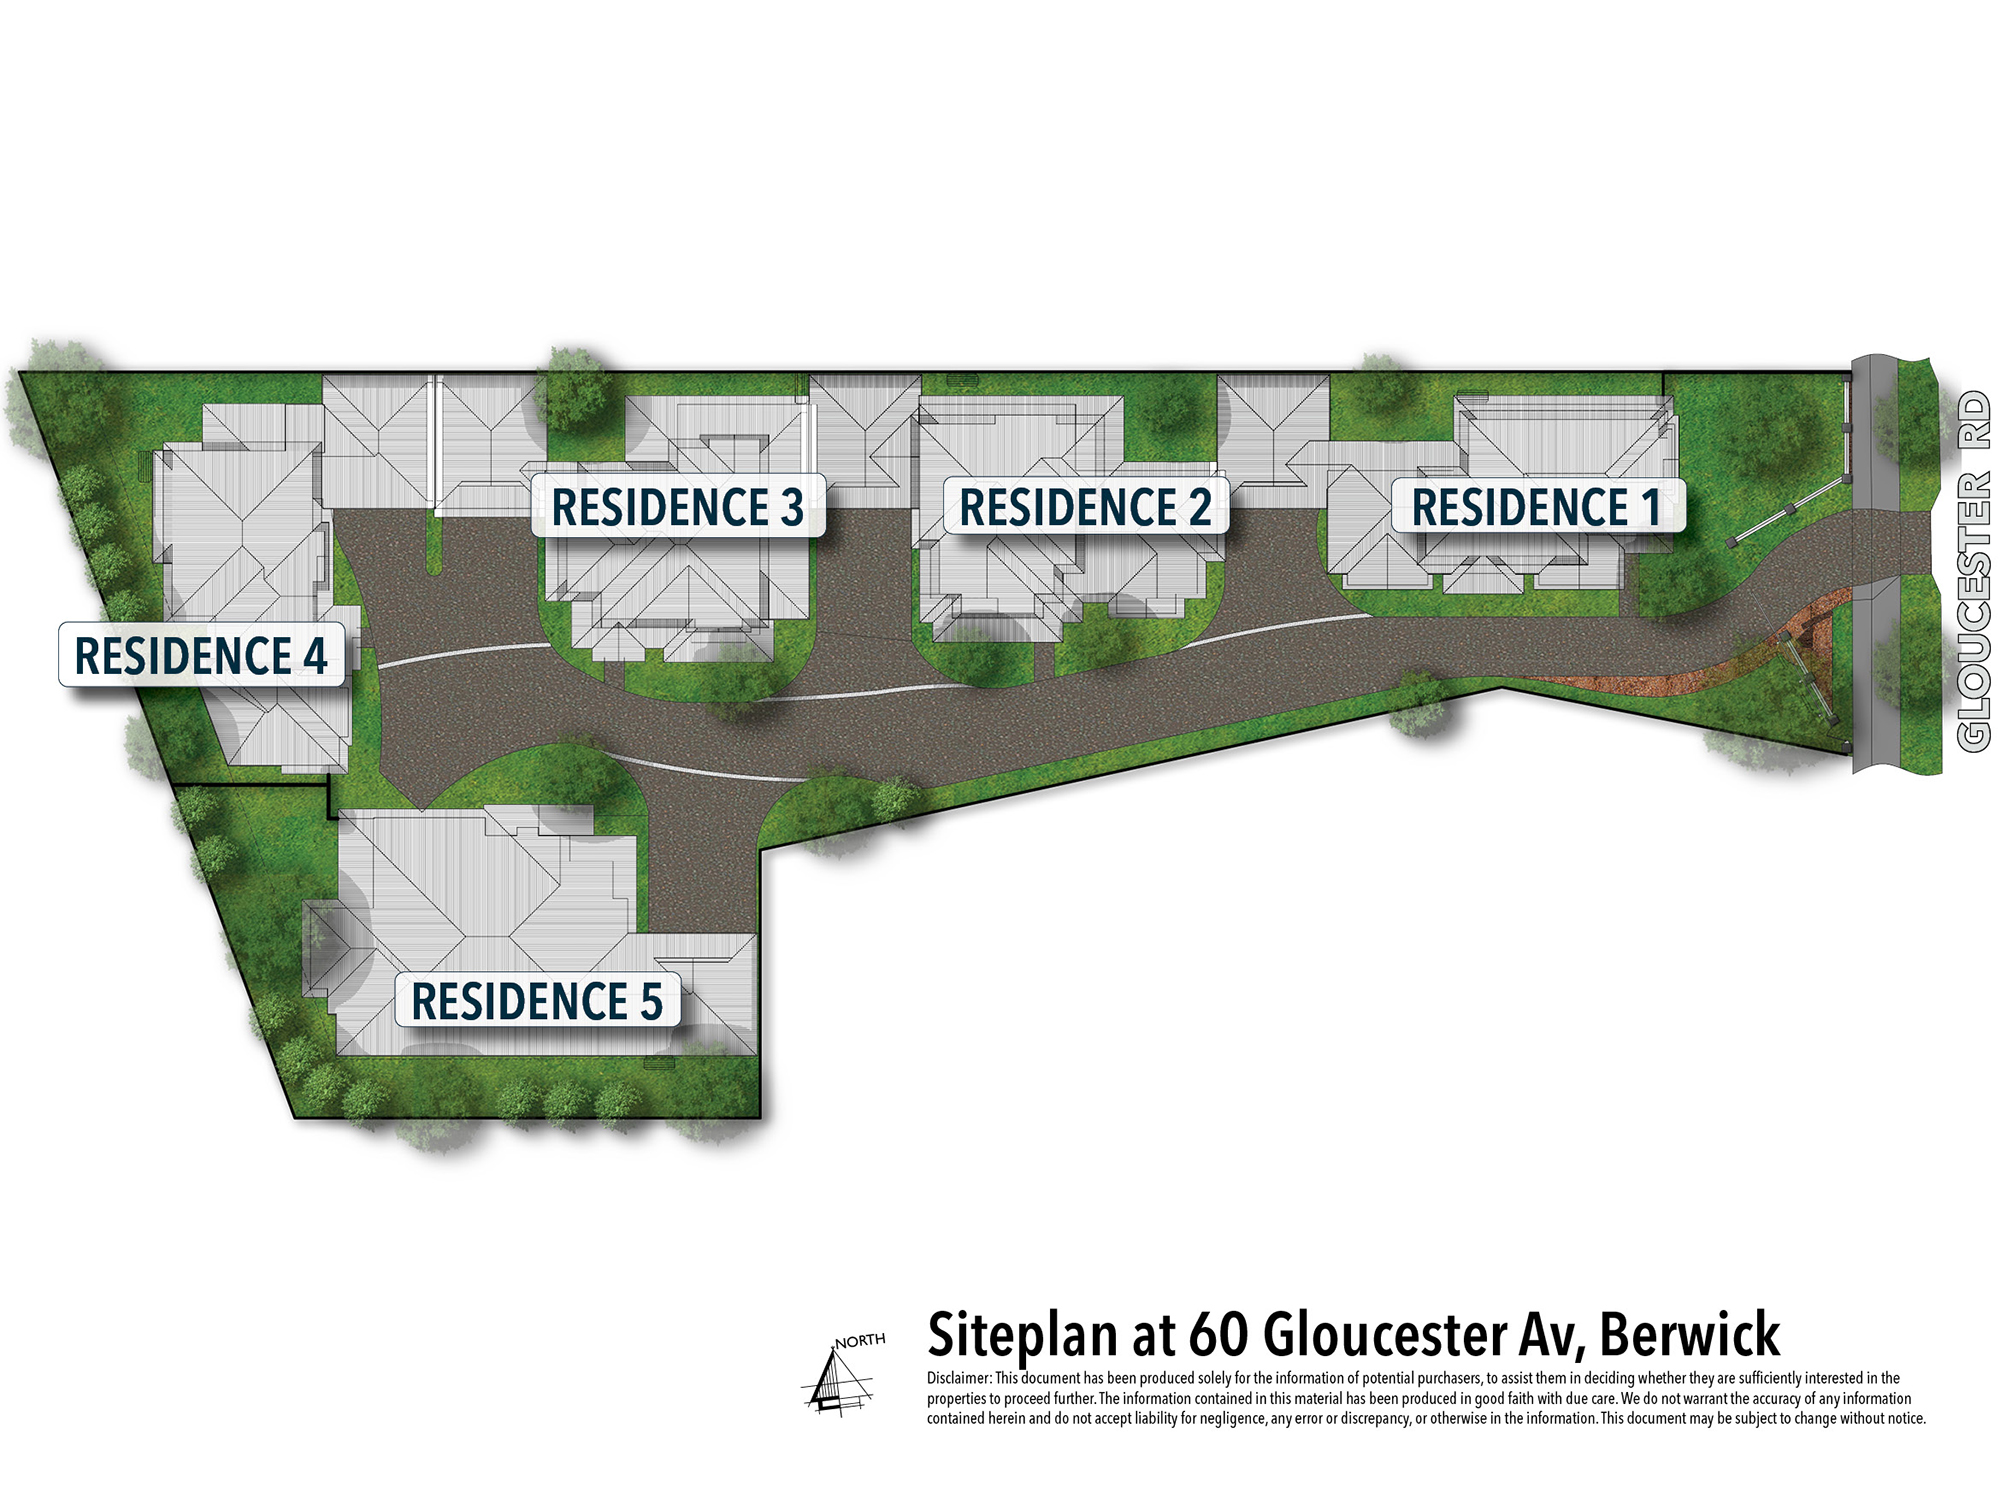 Siteplan   60 Gloucester Av, Berwick